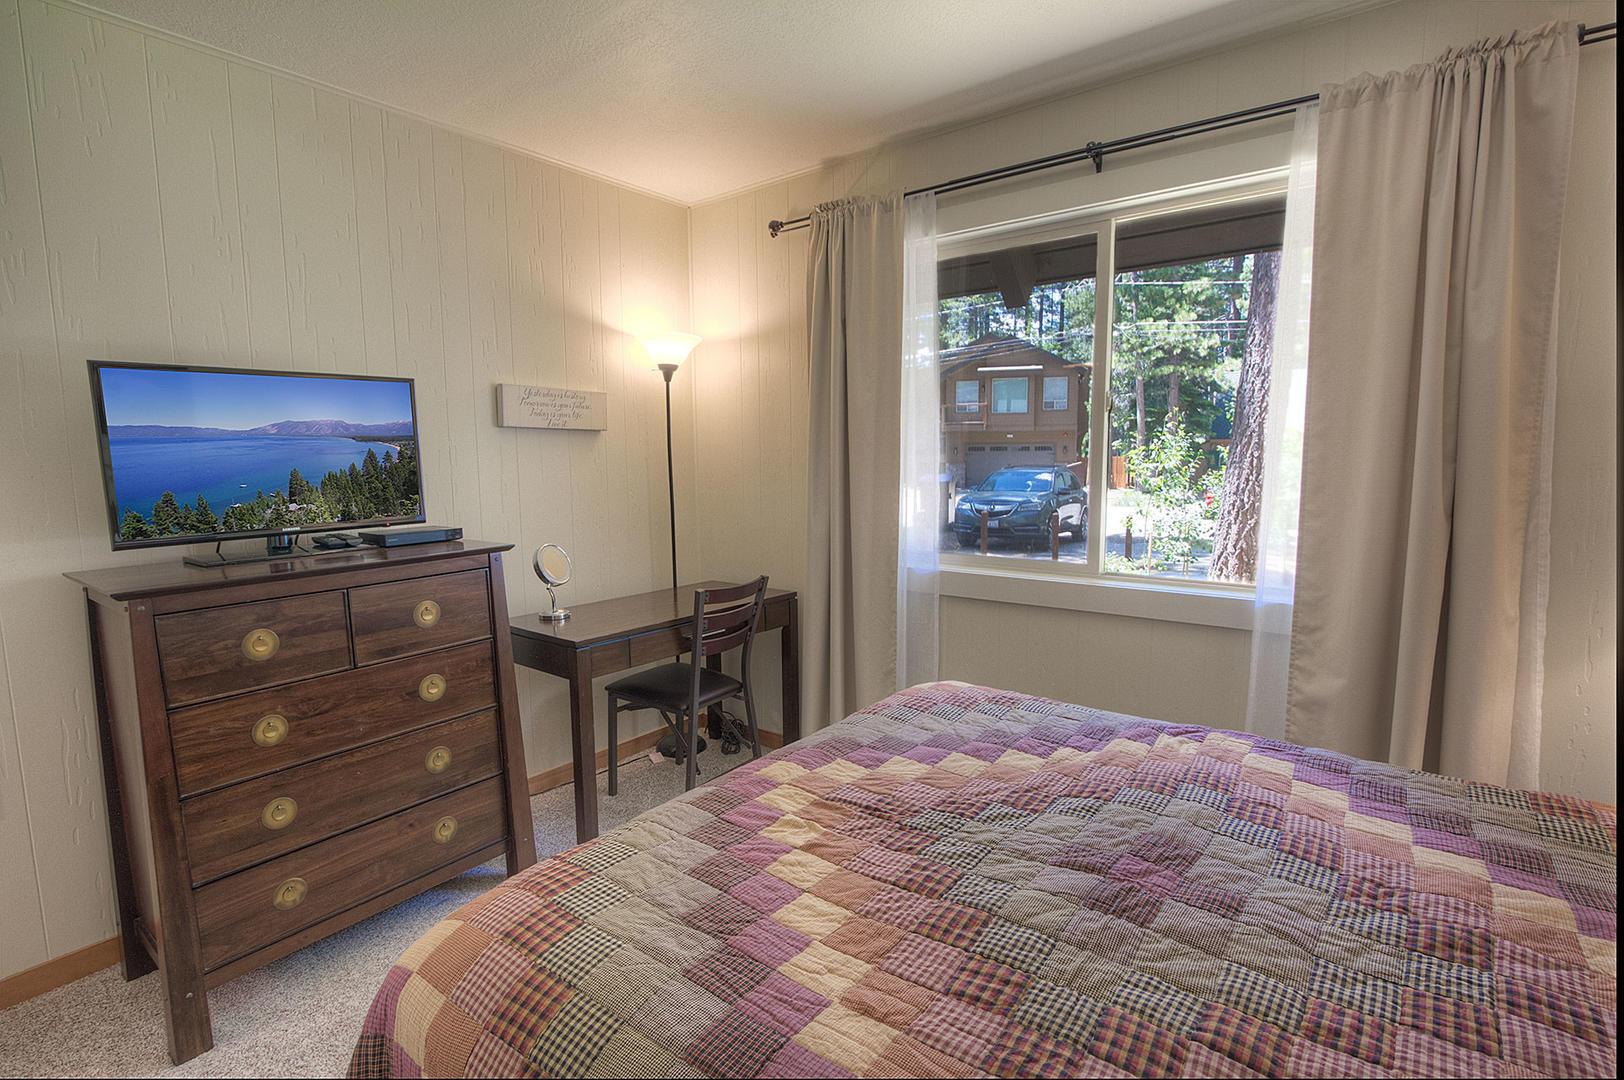 cyh0776 bedroom